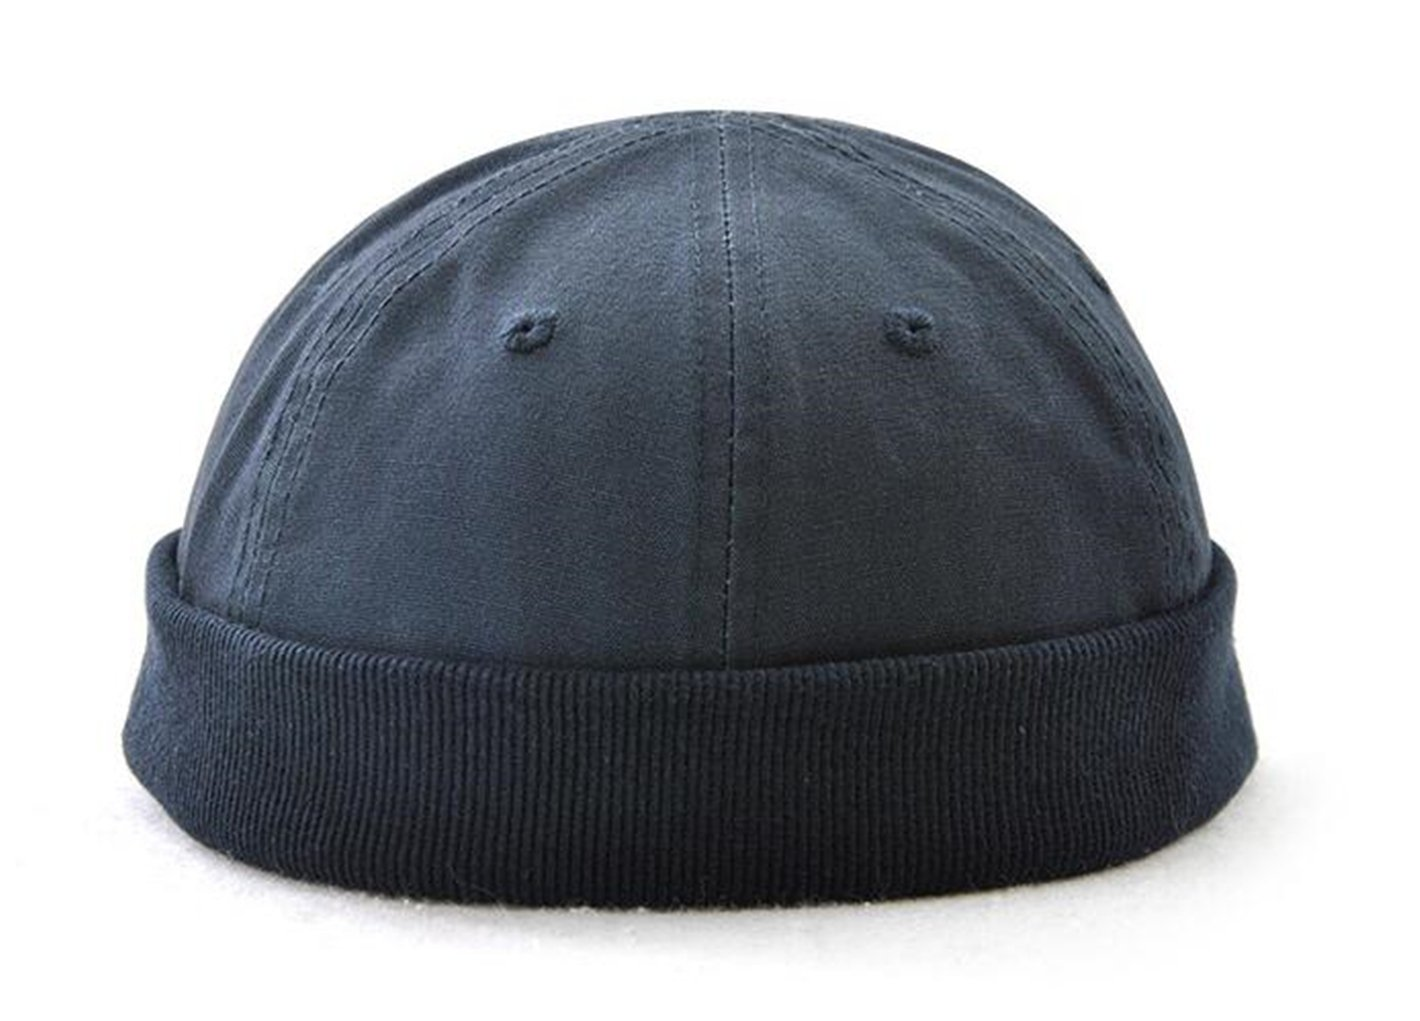 ae119b5318 Melii Cotton Kufi Hats Skull Docker Cap Solid For Men Teen Boys